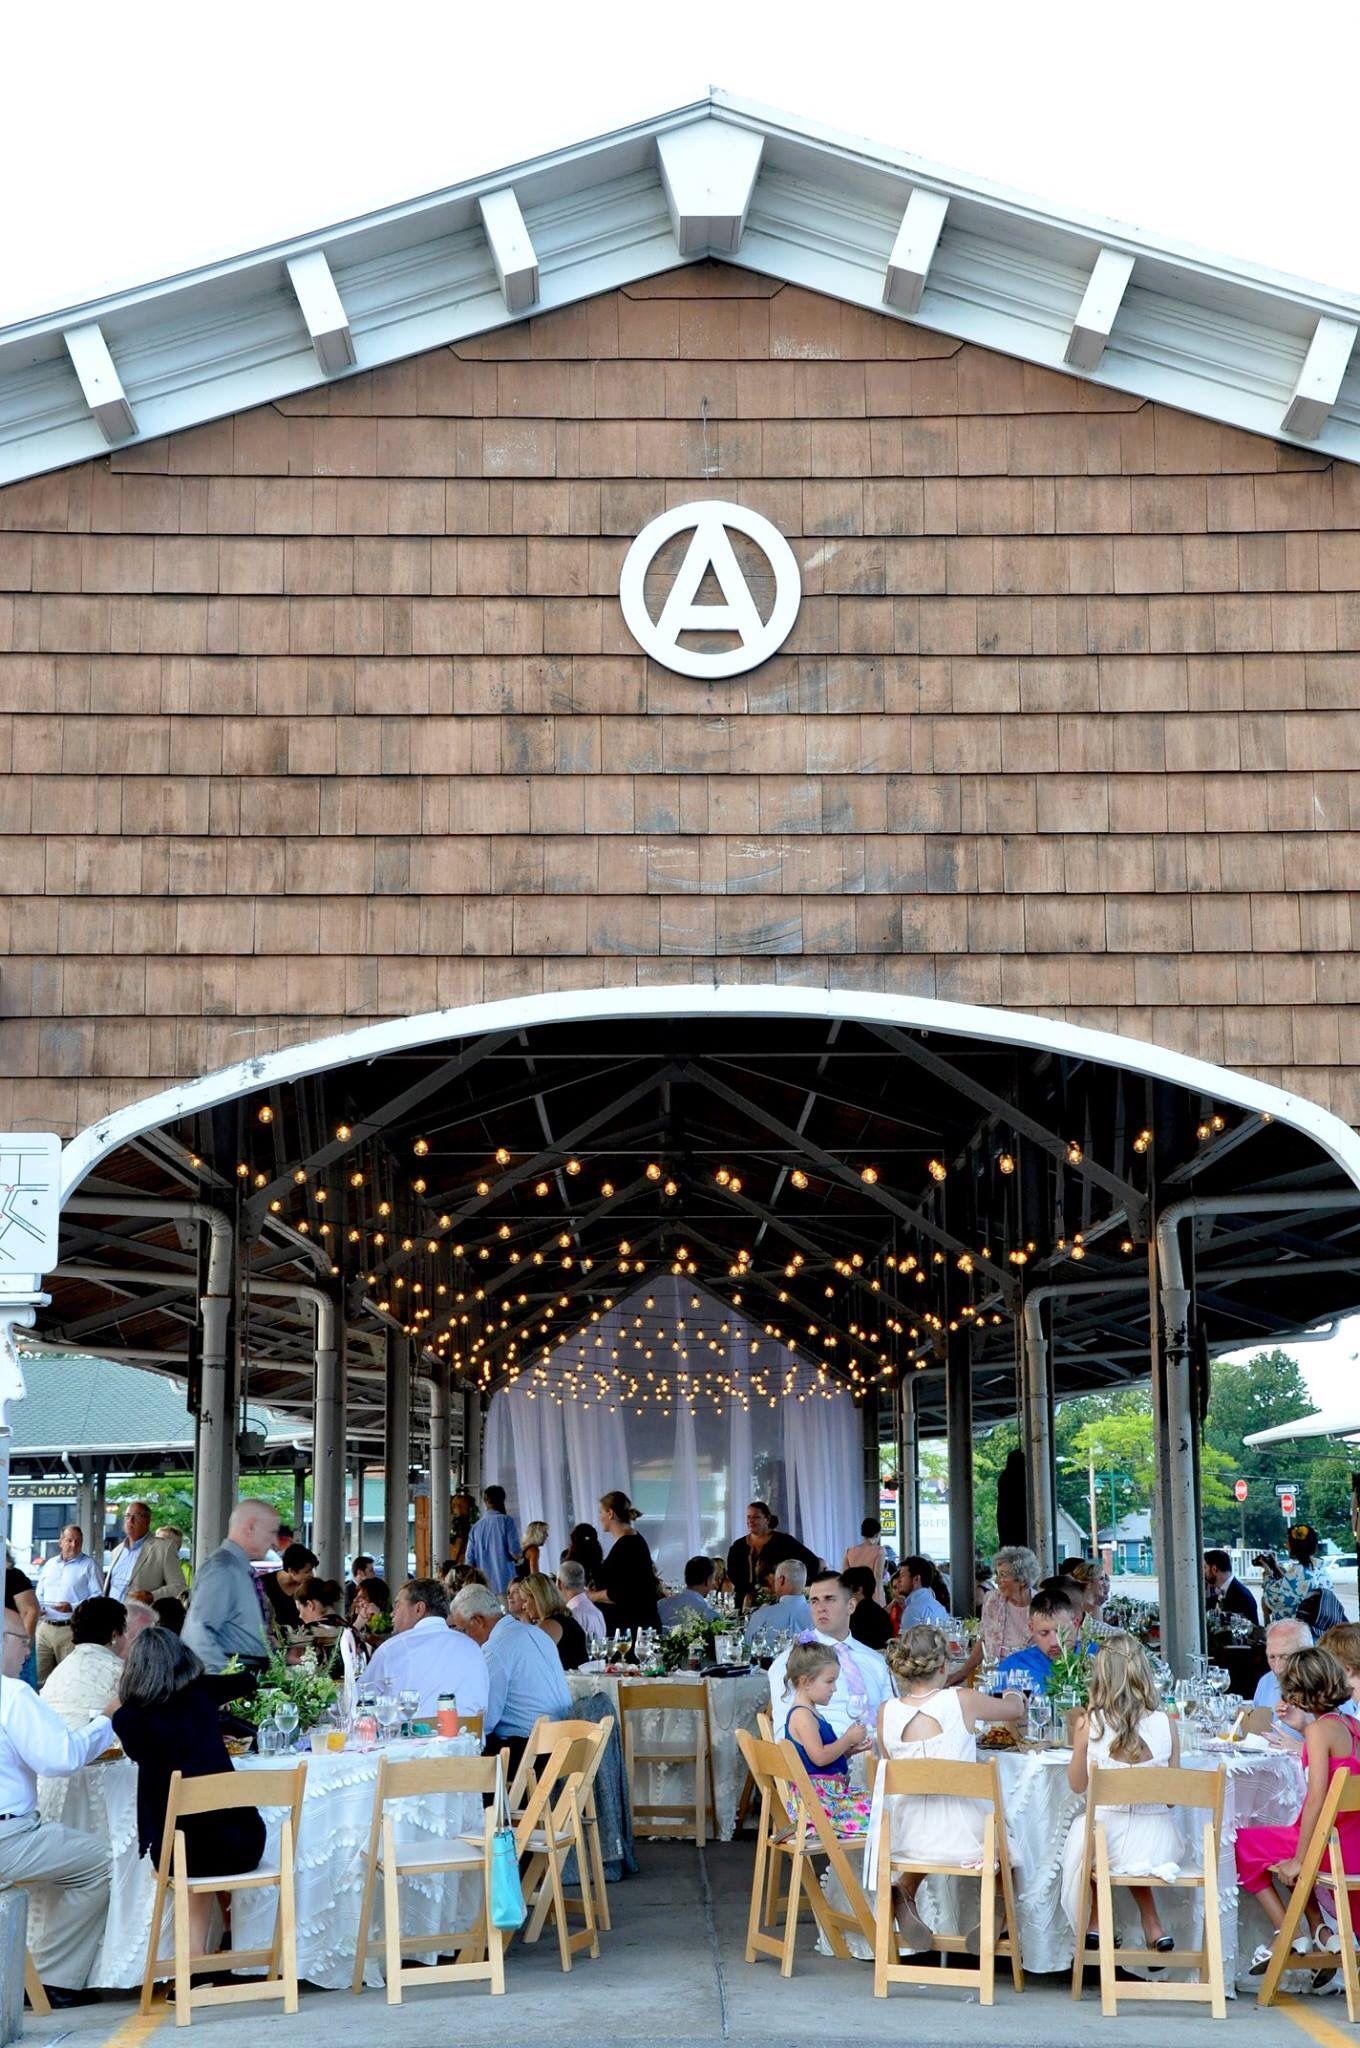 Rochester Public Market Reception Under A Shed Cafe Lights Wedding Ideas Outdoor Venue Weddings